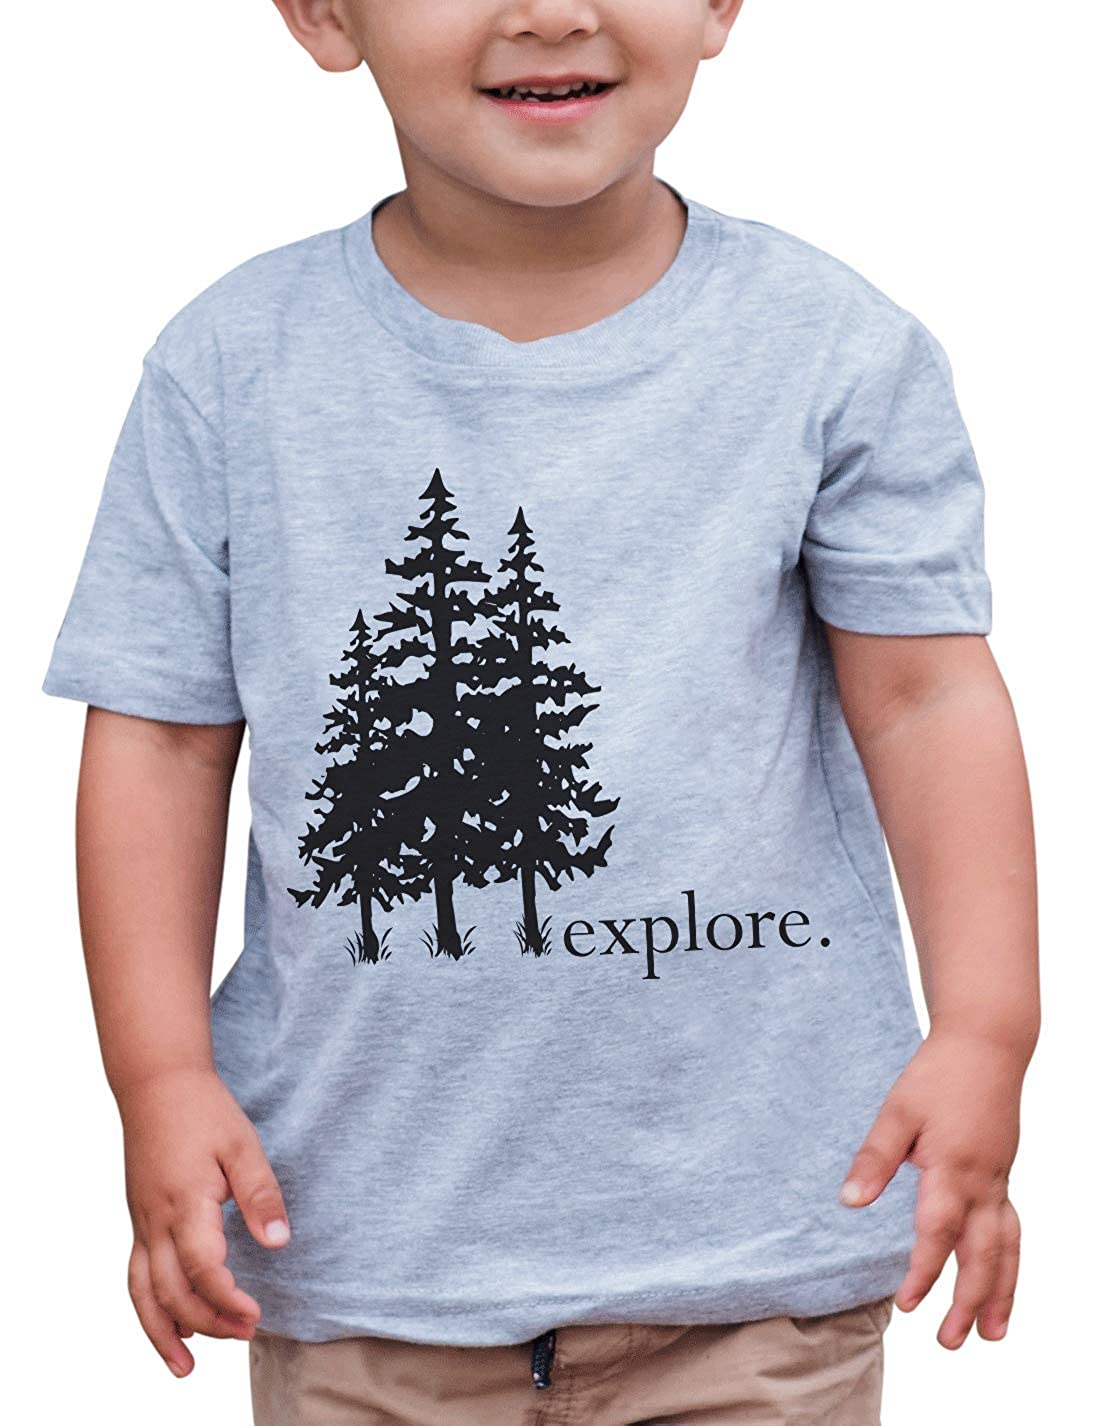 7 ate 9 Apparel Kids Explore Trees Outdoors T-Shirt